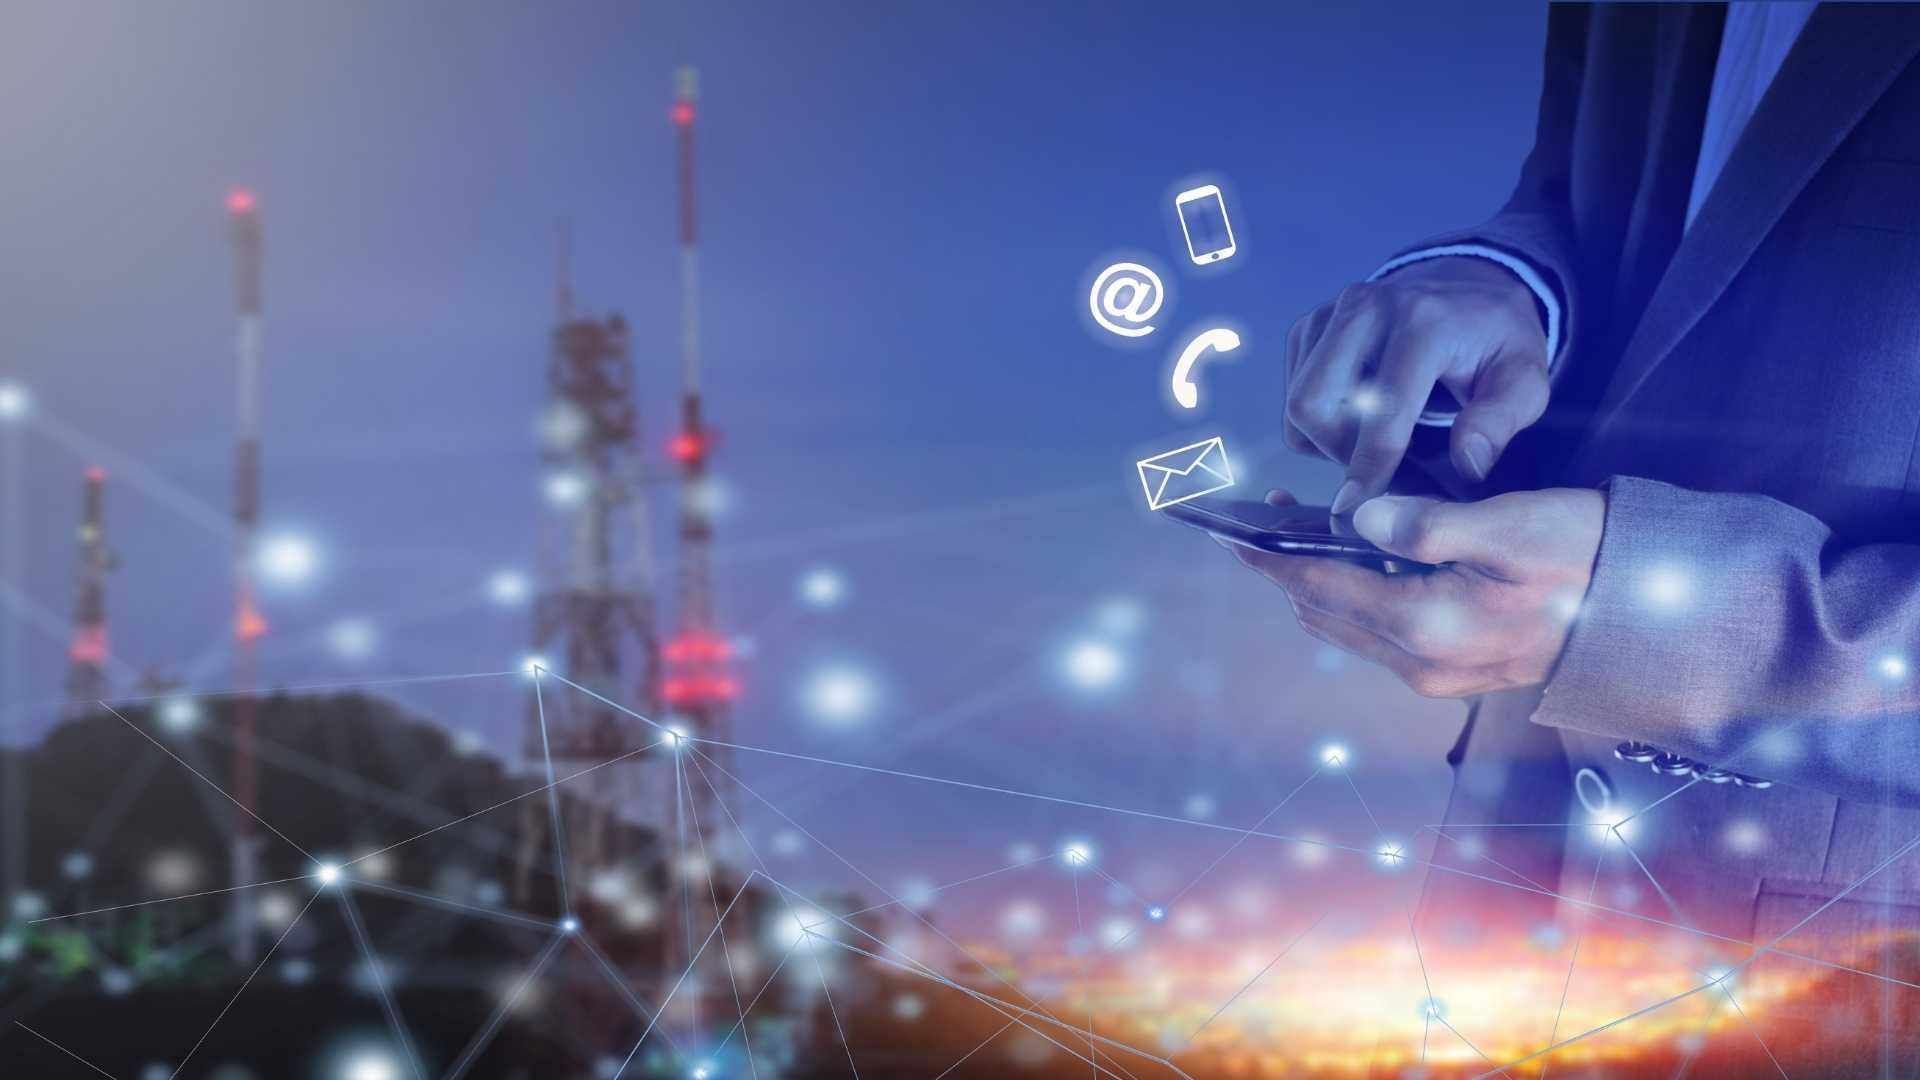 Conseil et stratégie marketing digital